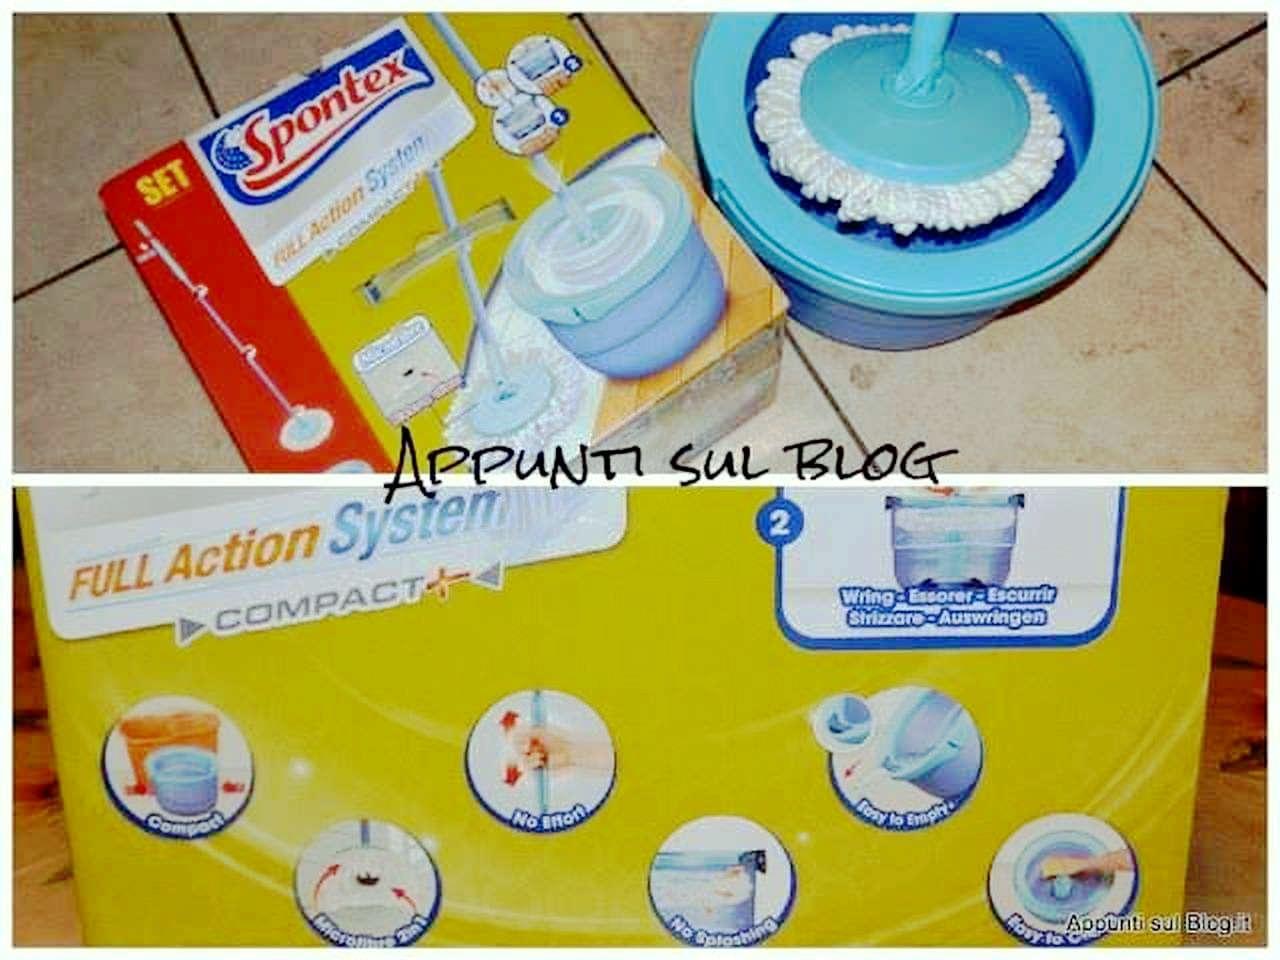 #pulizie Spontex : lavapavimenti Full Action System con mop rotante